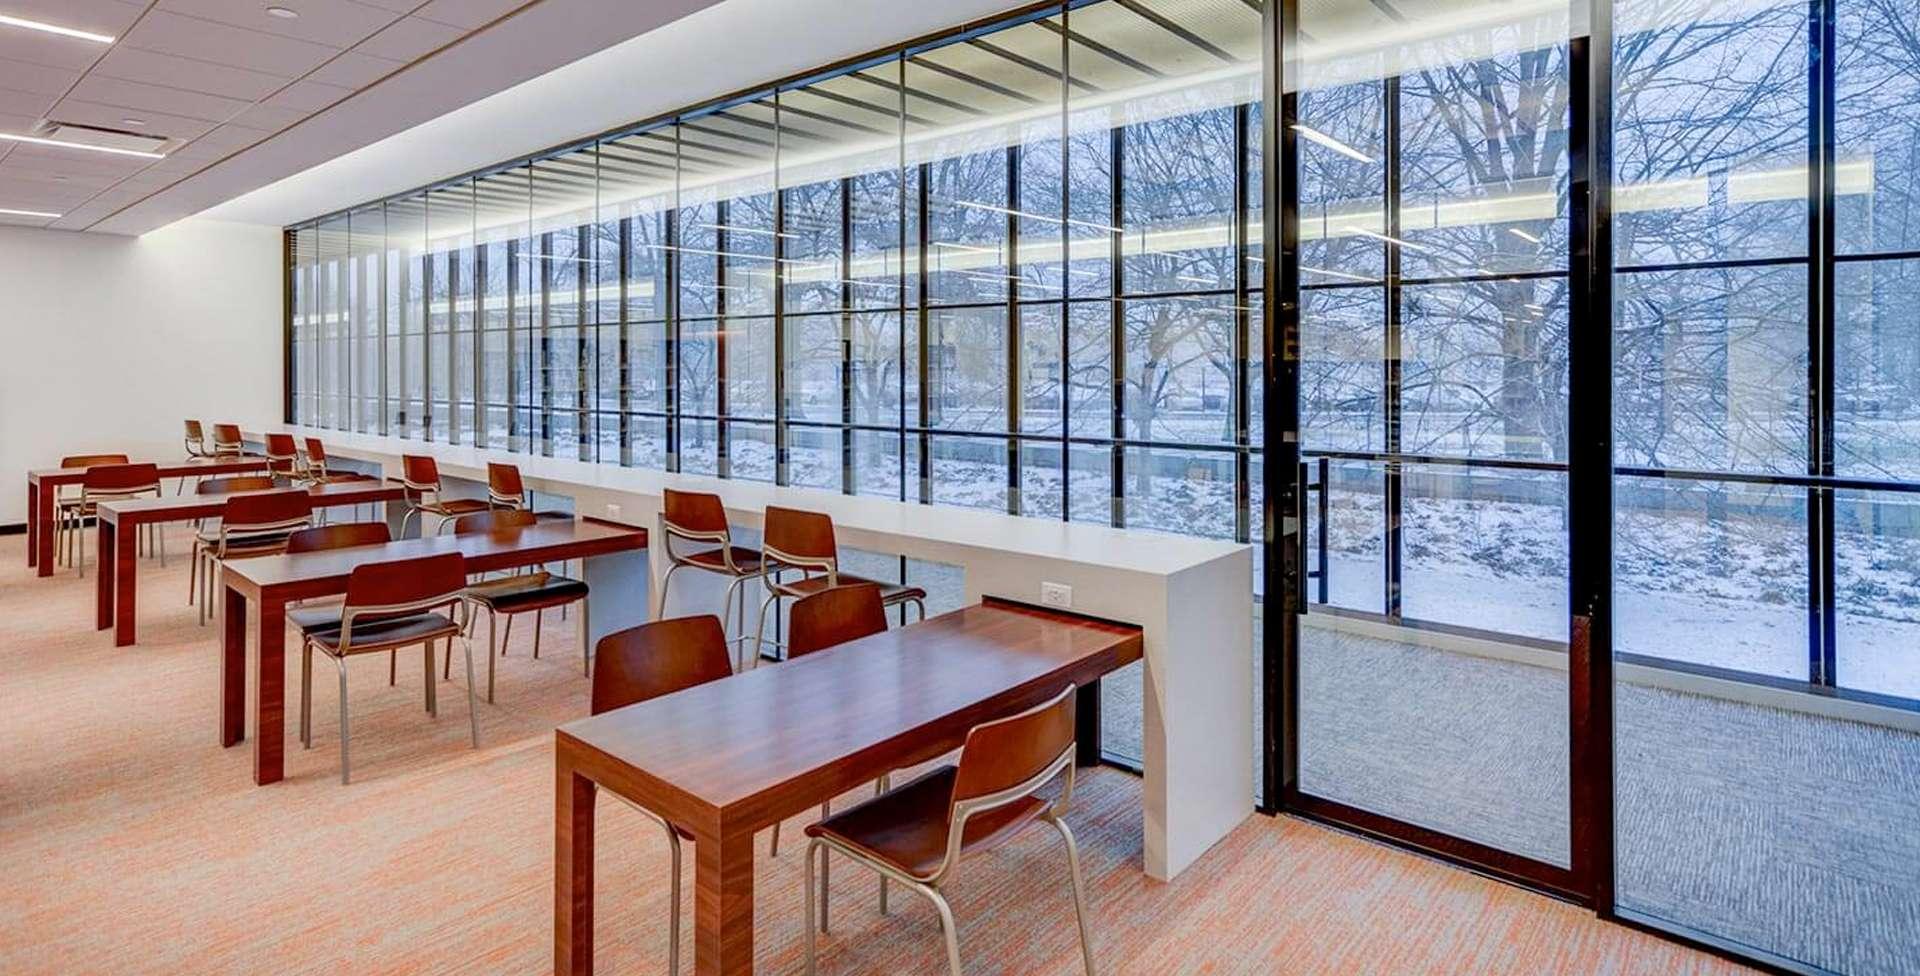 DG Series Office Glass Walls